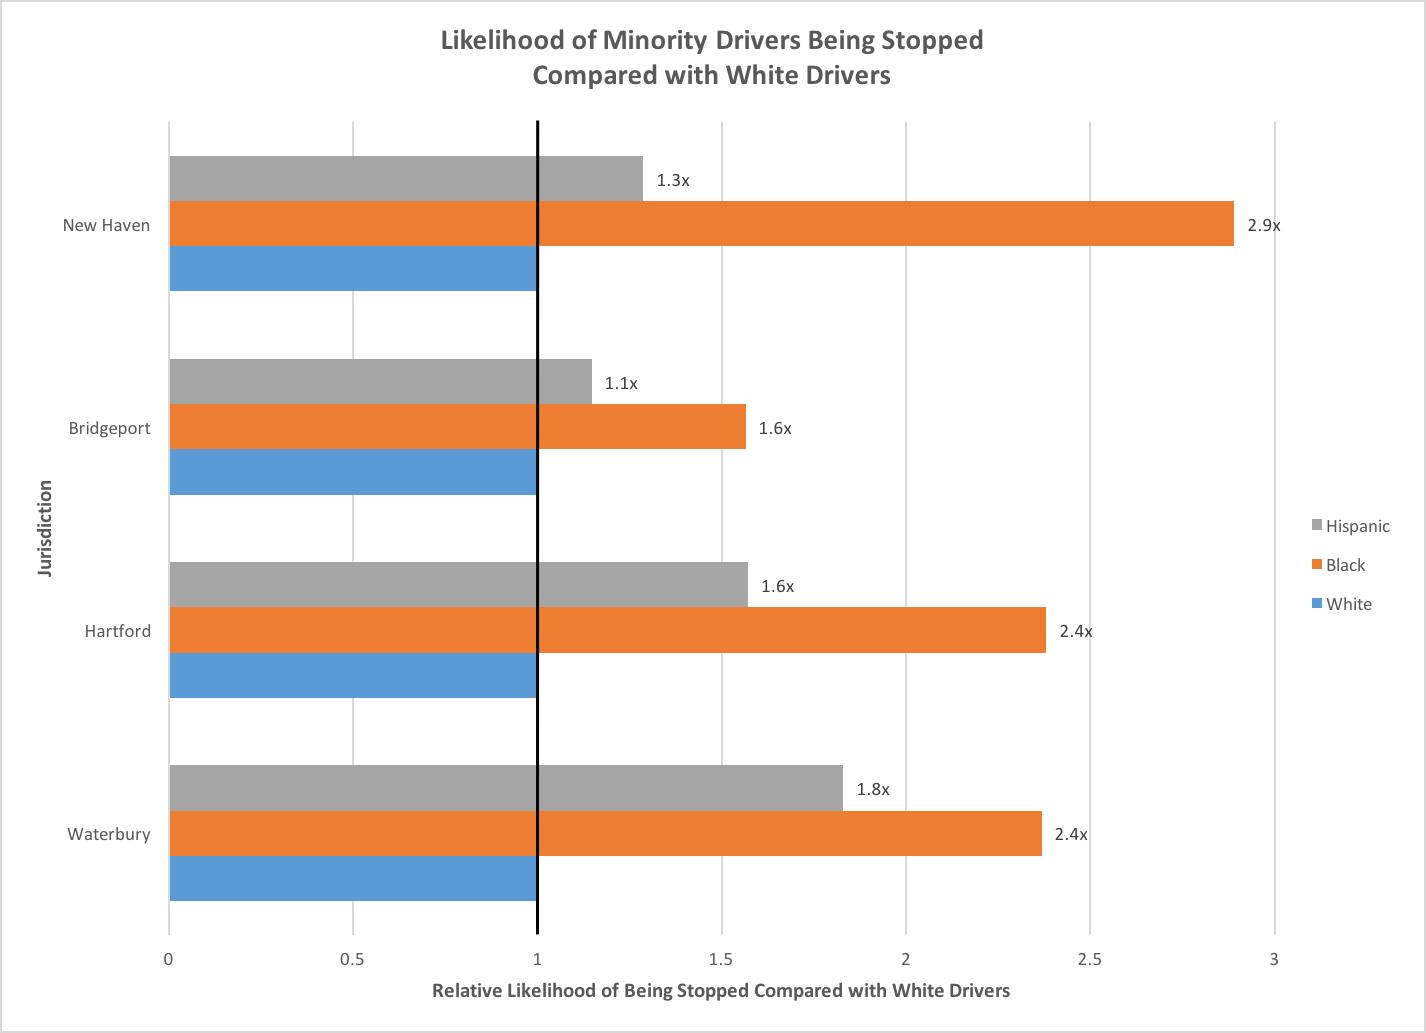 Likelihood of Minority Drivers Being Stopped